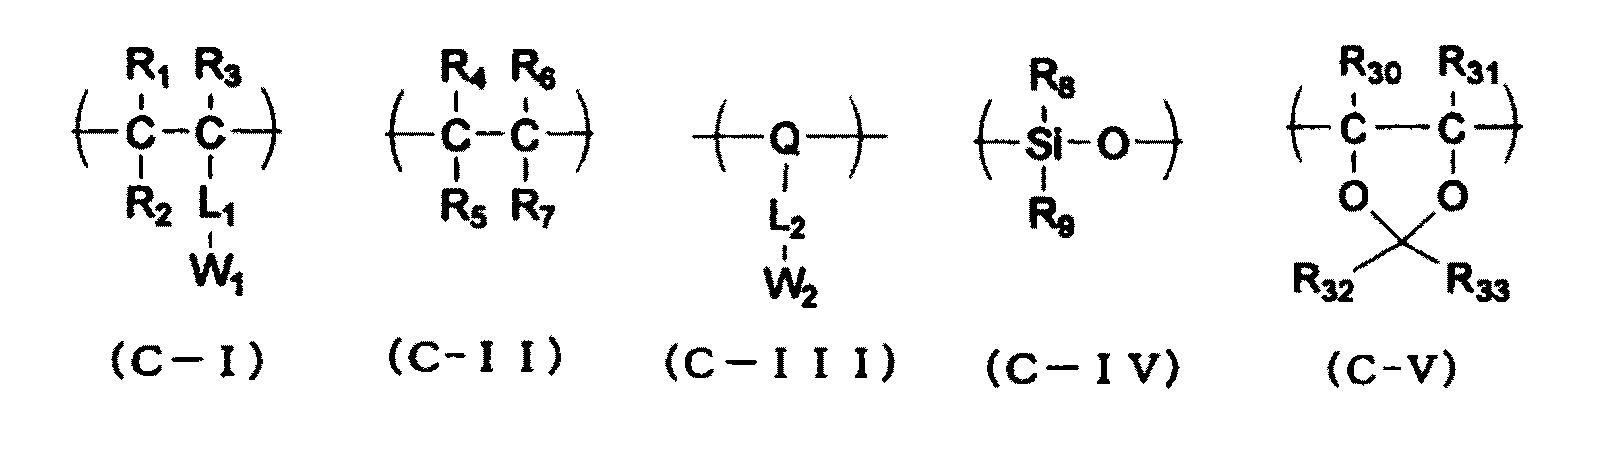 Figure 112011039817284-pct00076